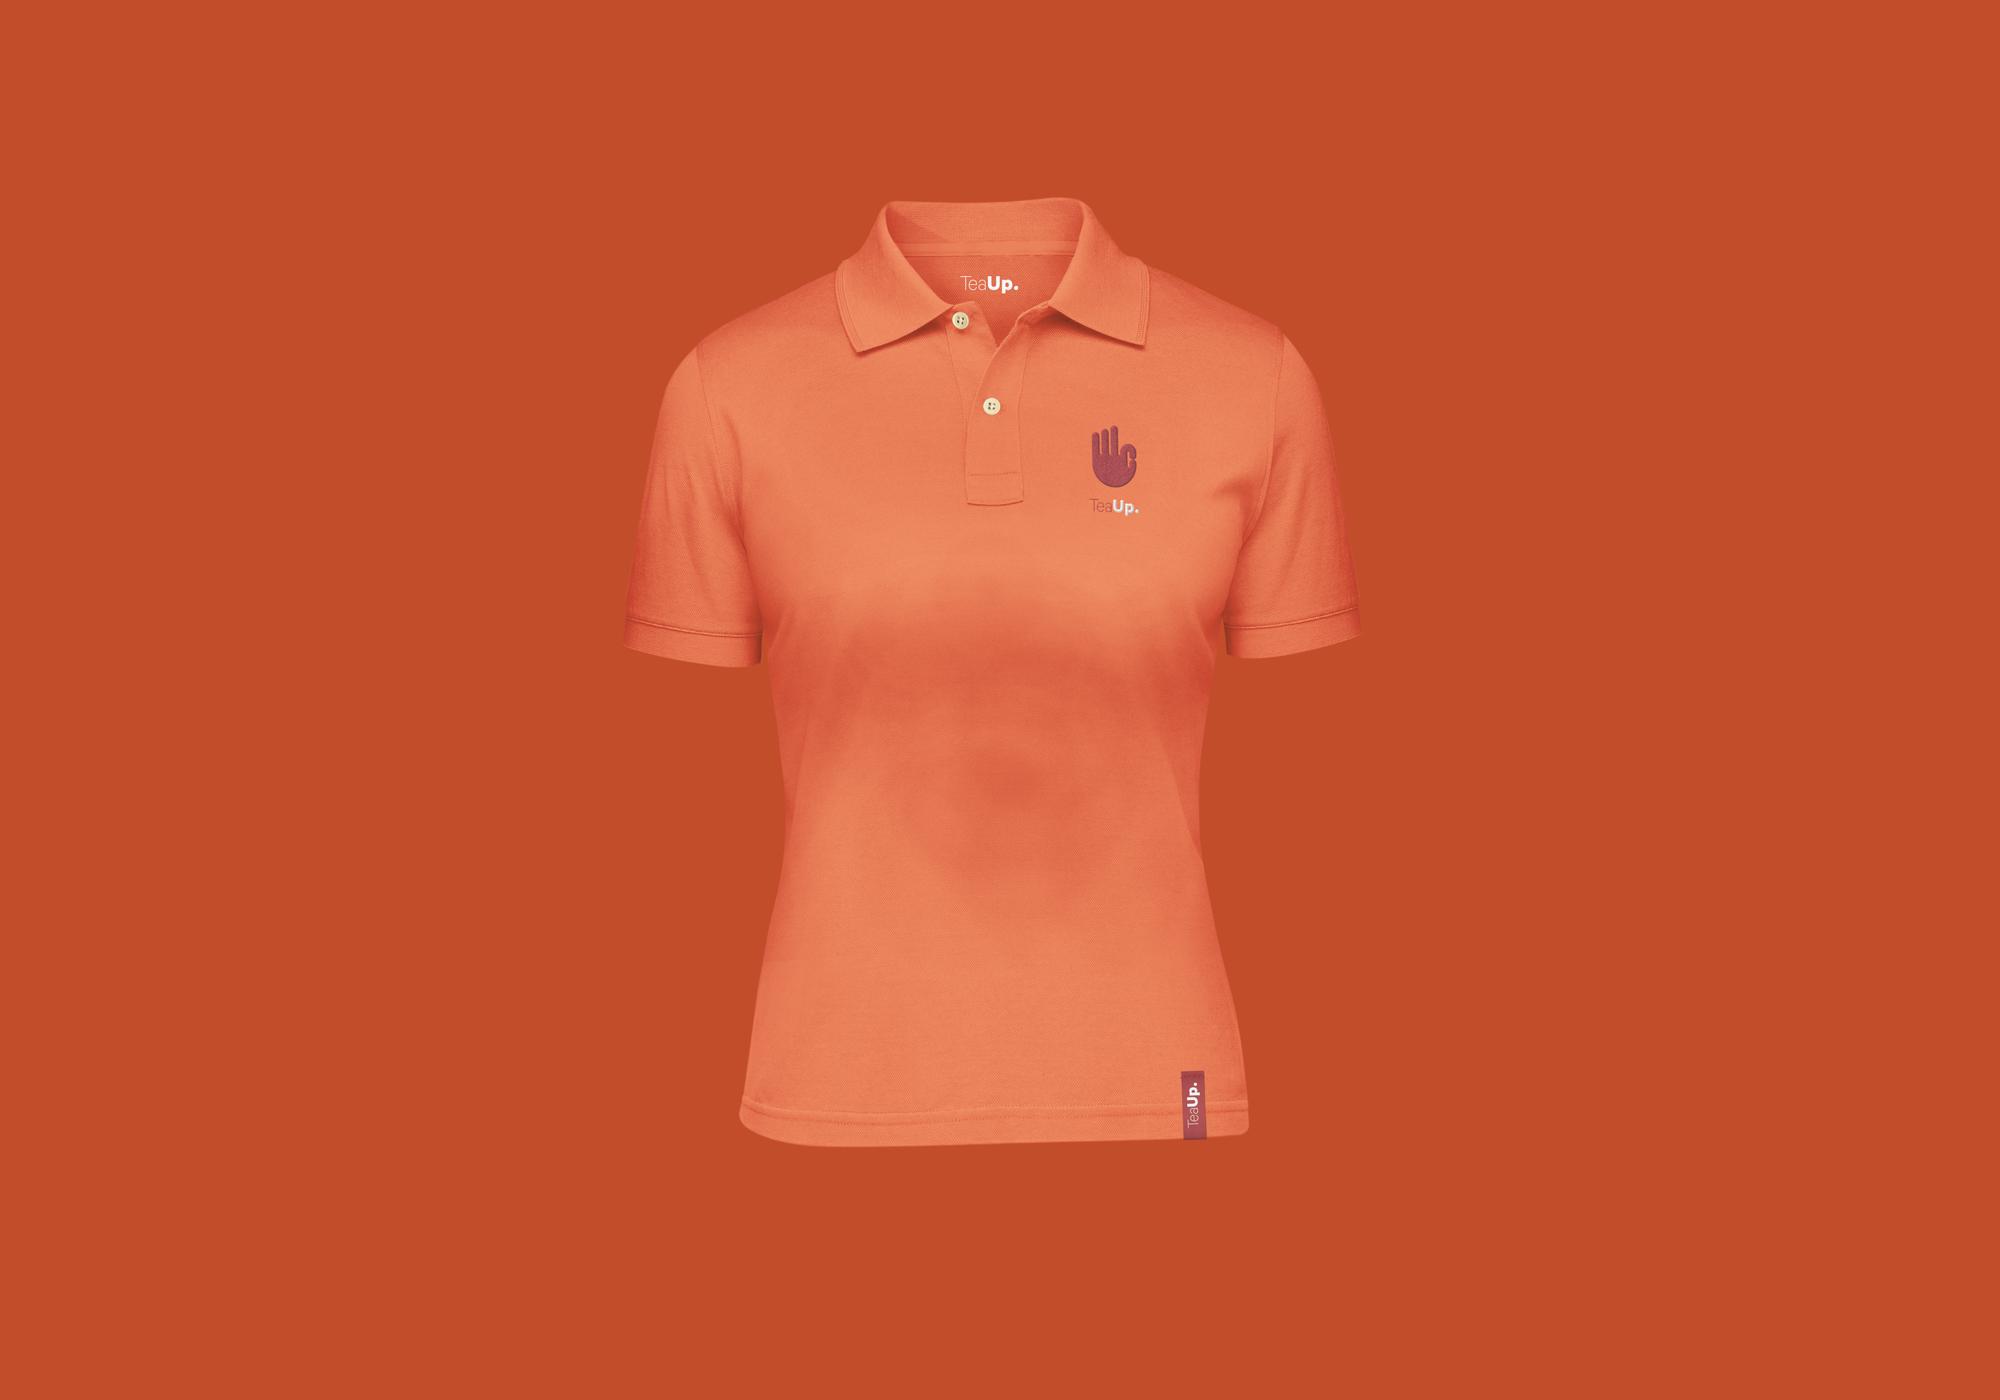 TeaUp Womens Polo